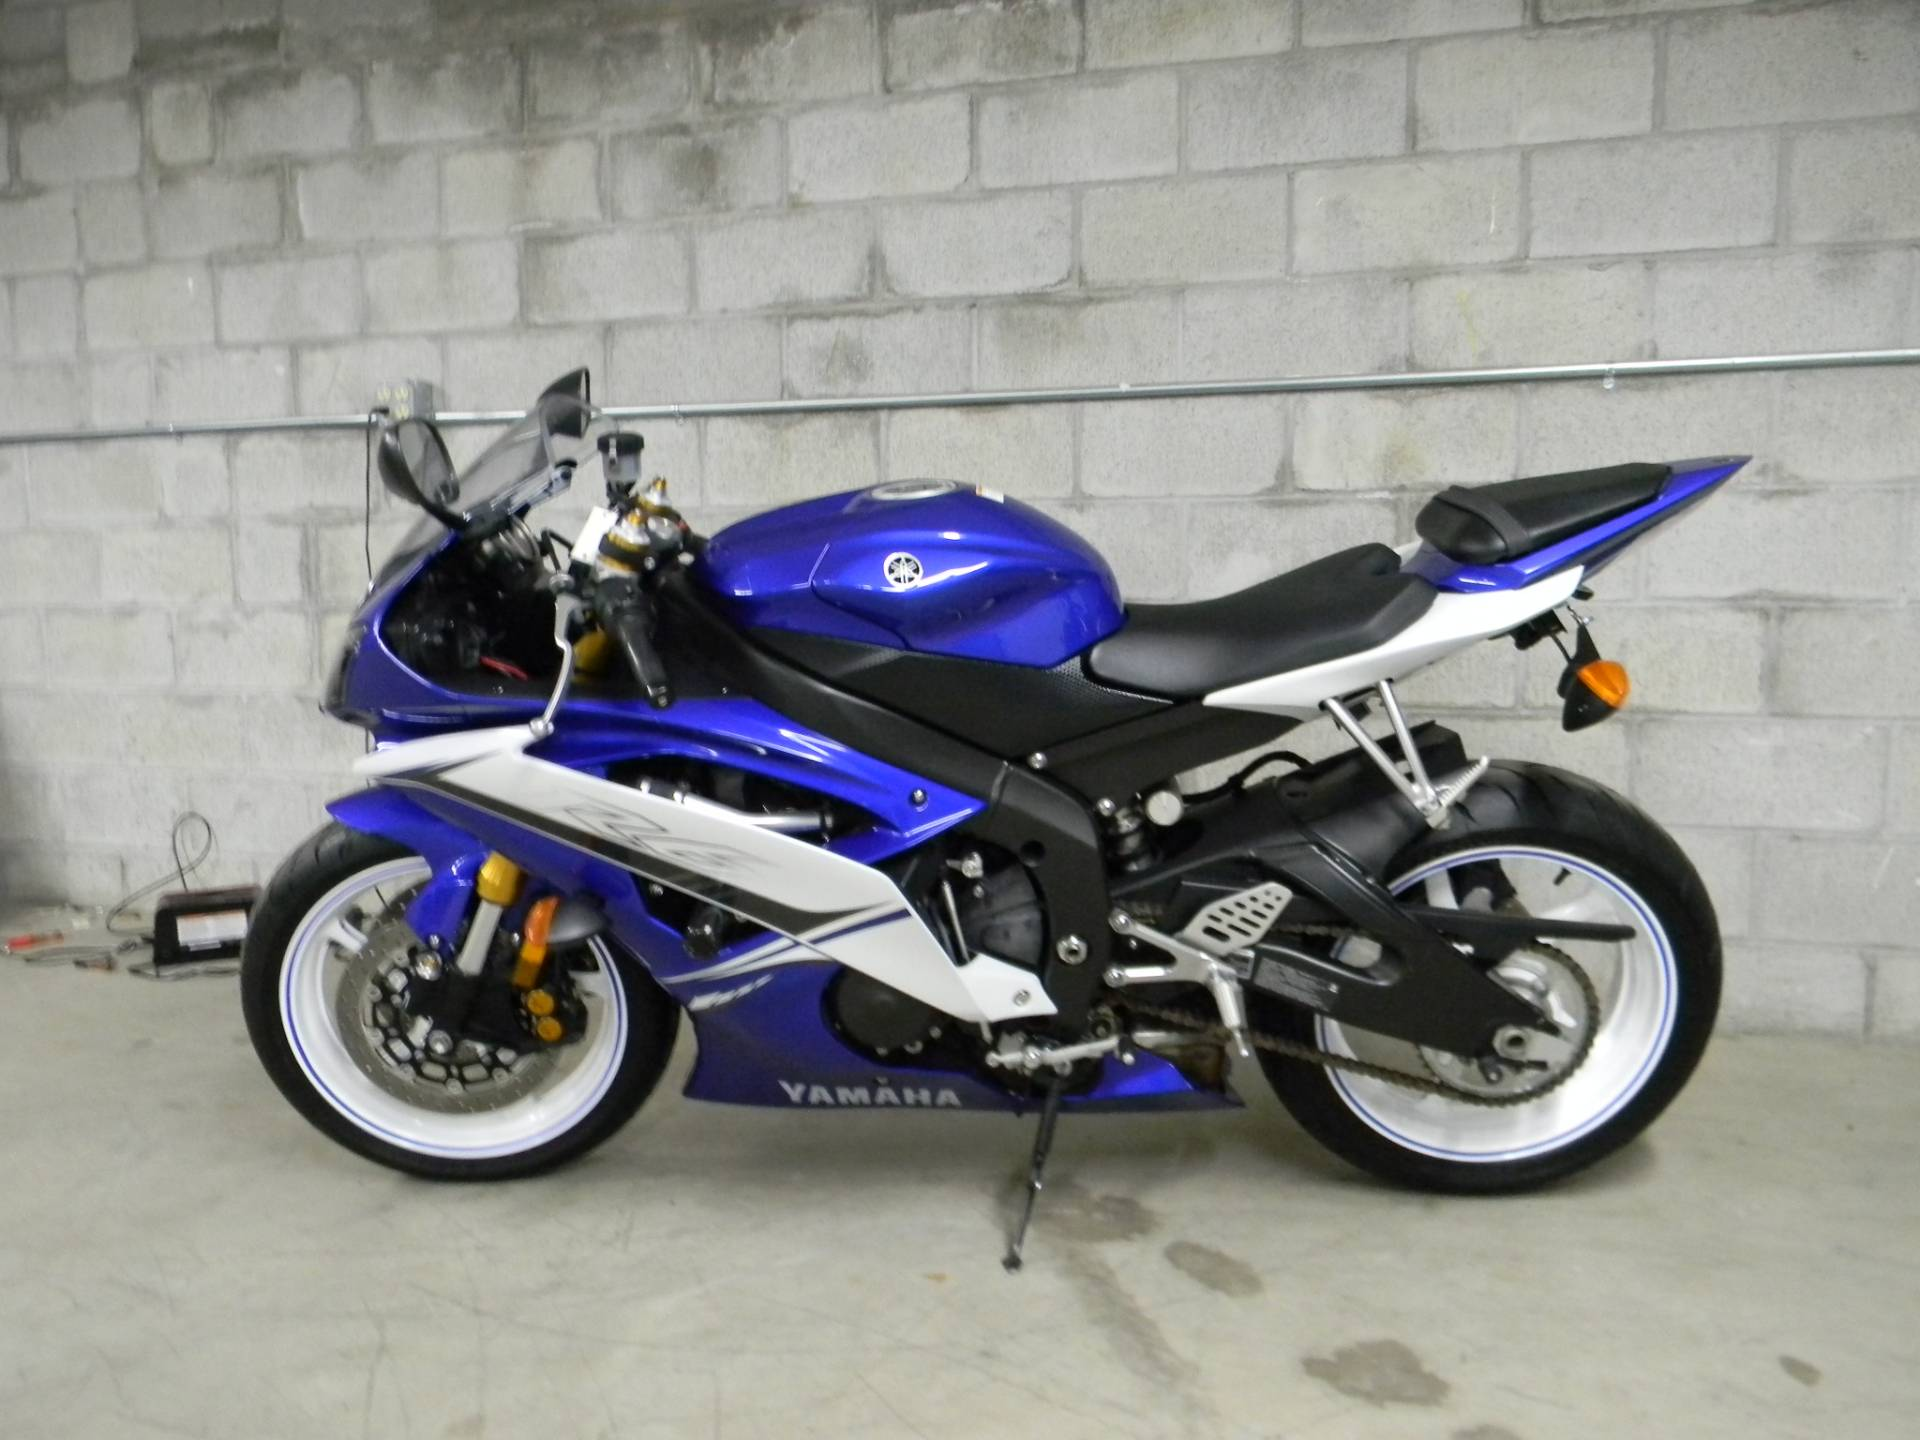 2011 Yamaha YZF-R6 5